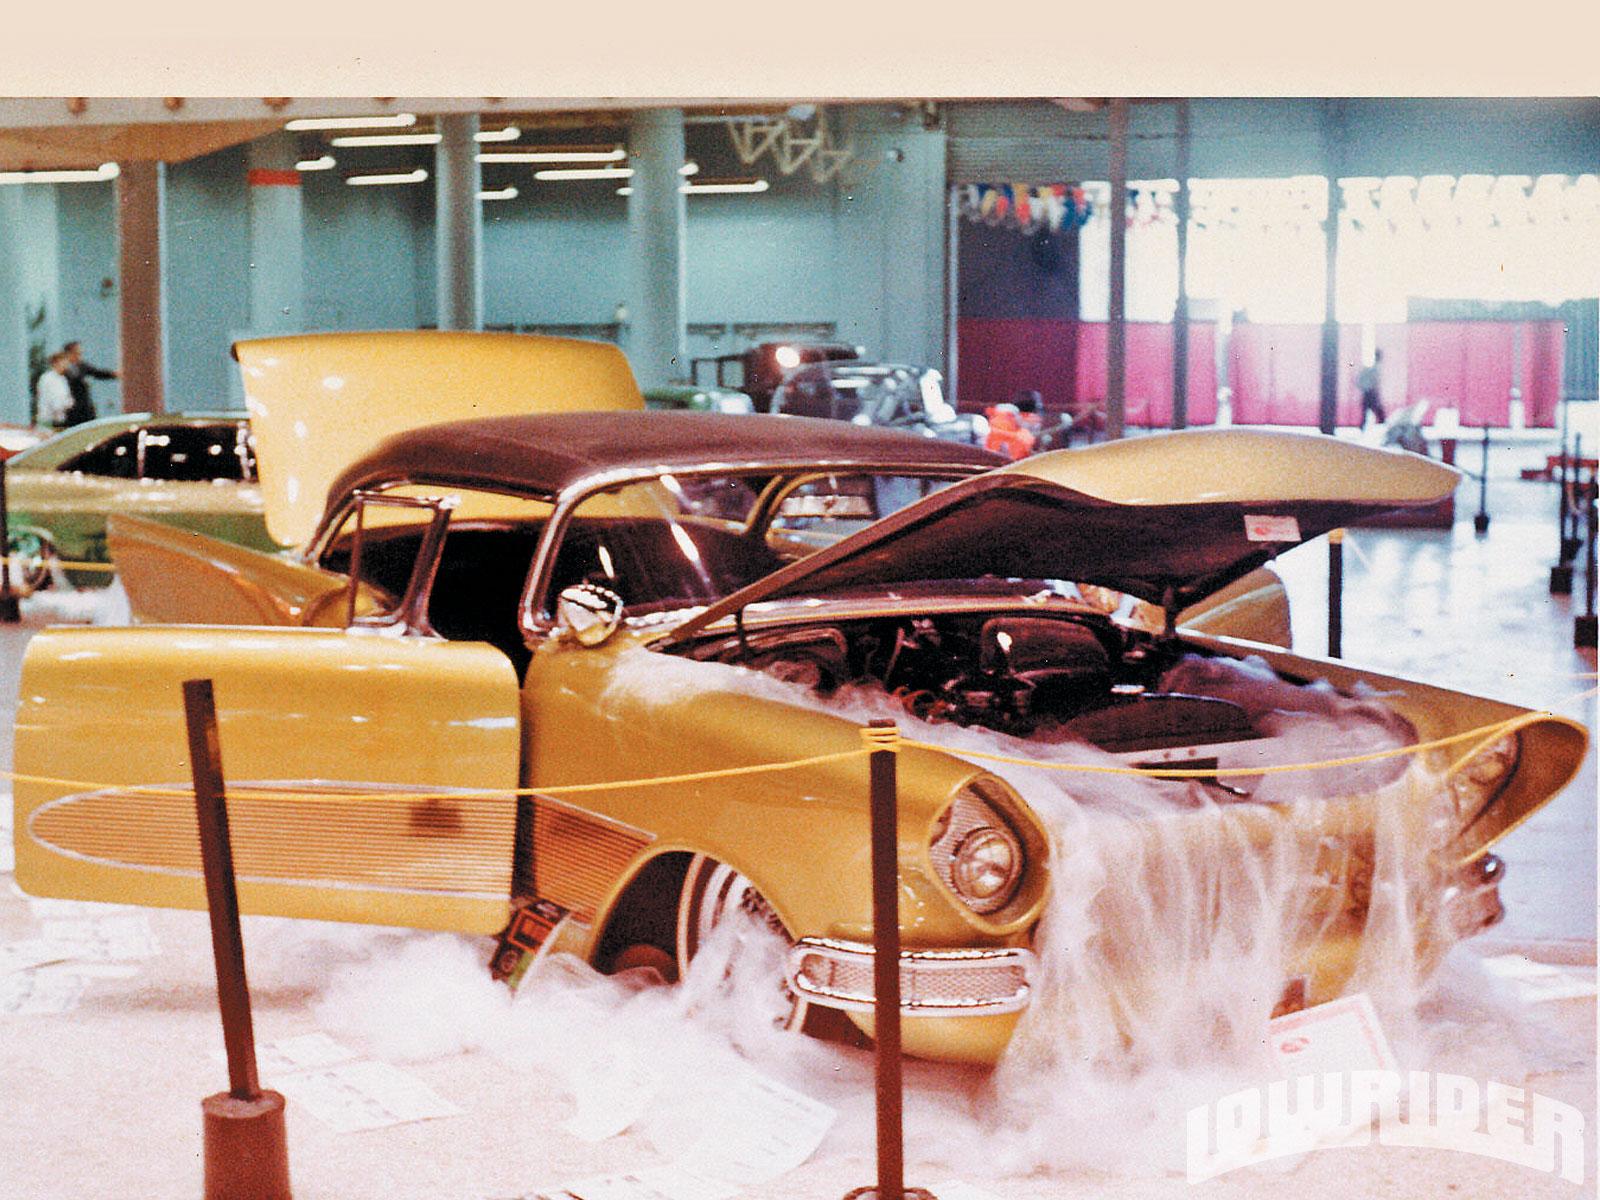 Custom Vintage Lowriders - 1969 Buick Riviera - Lowrider ...